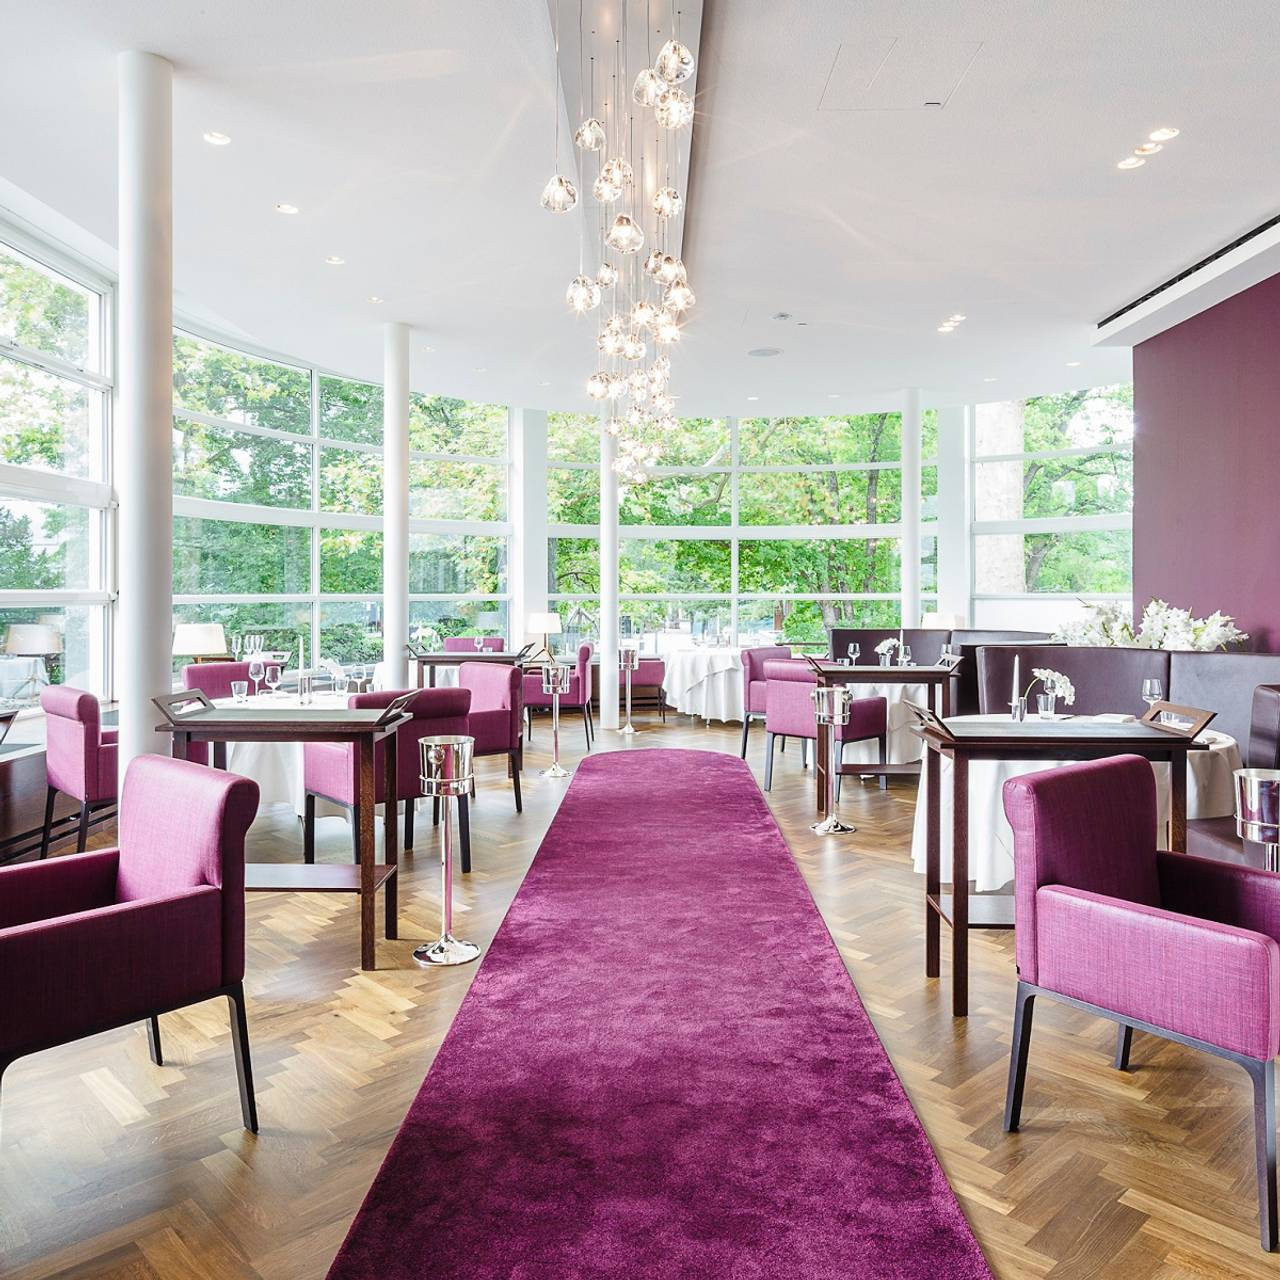 Lafleur Restaurant - Frankfurt am Main, HE   OpenTable